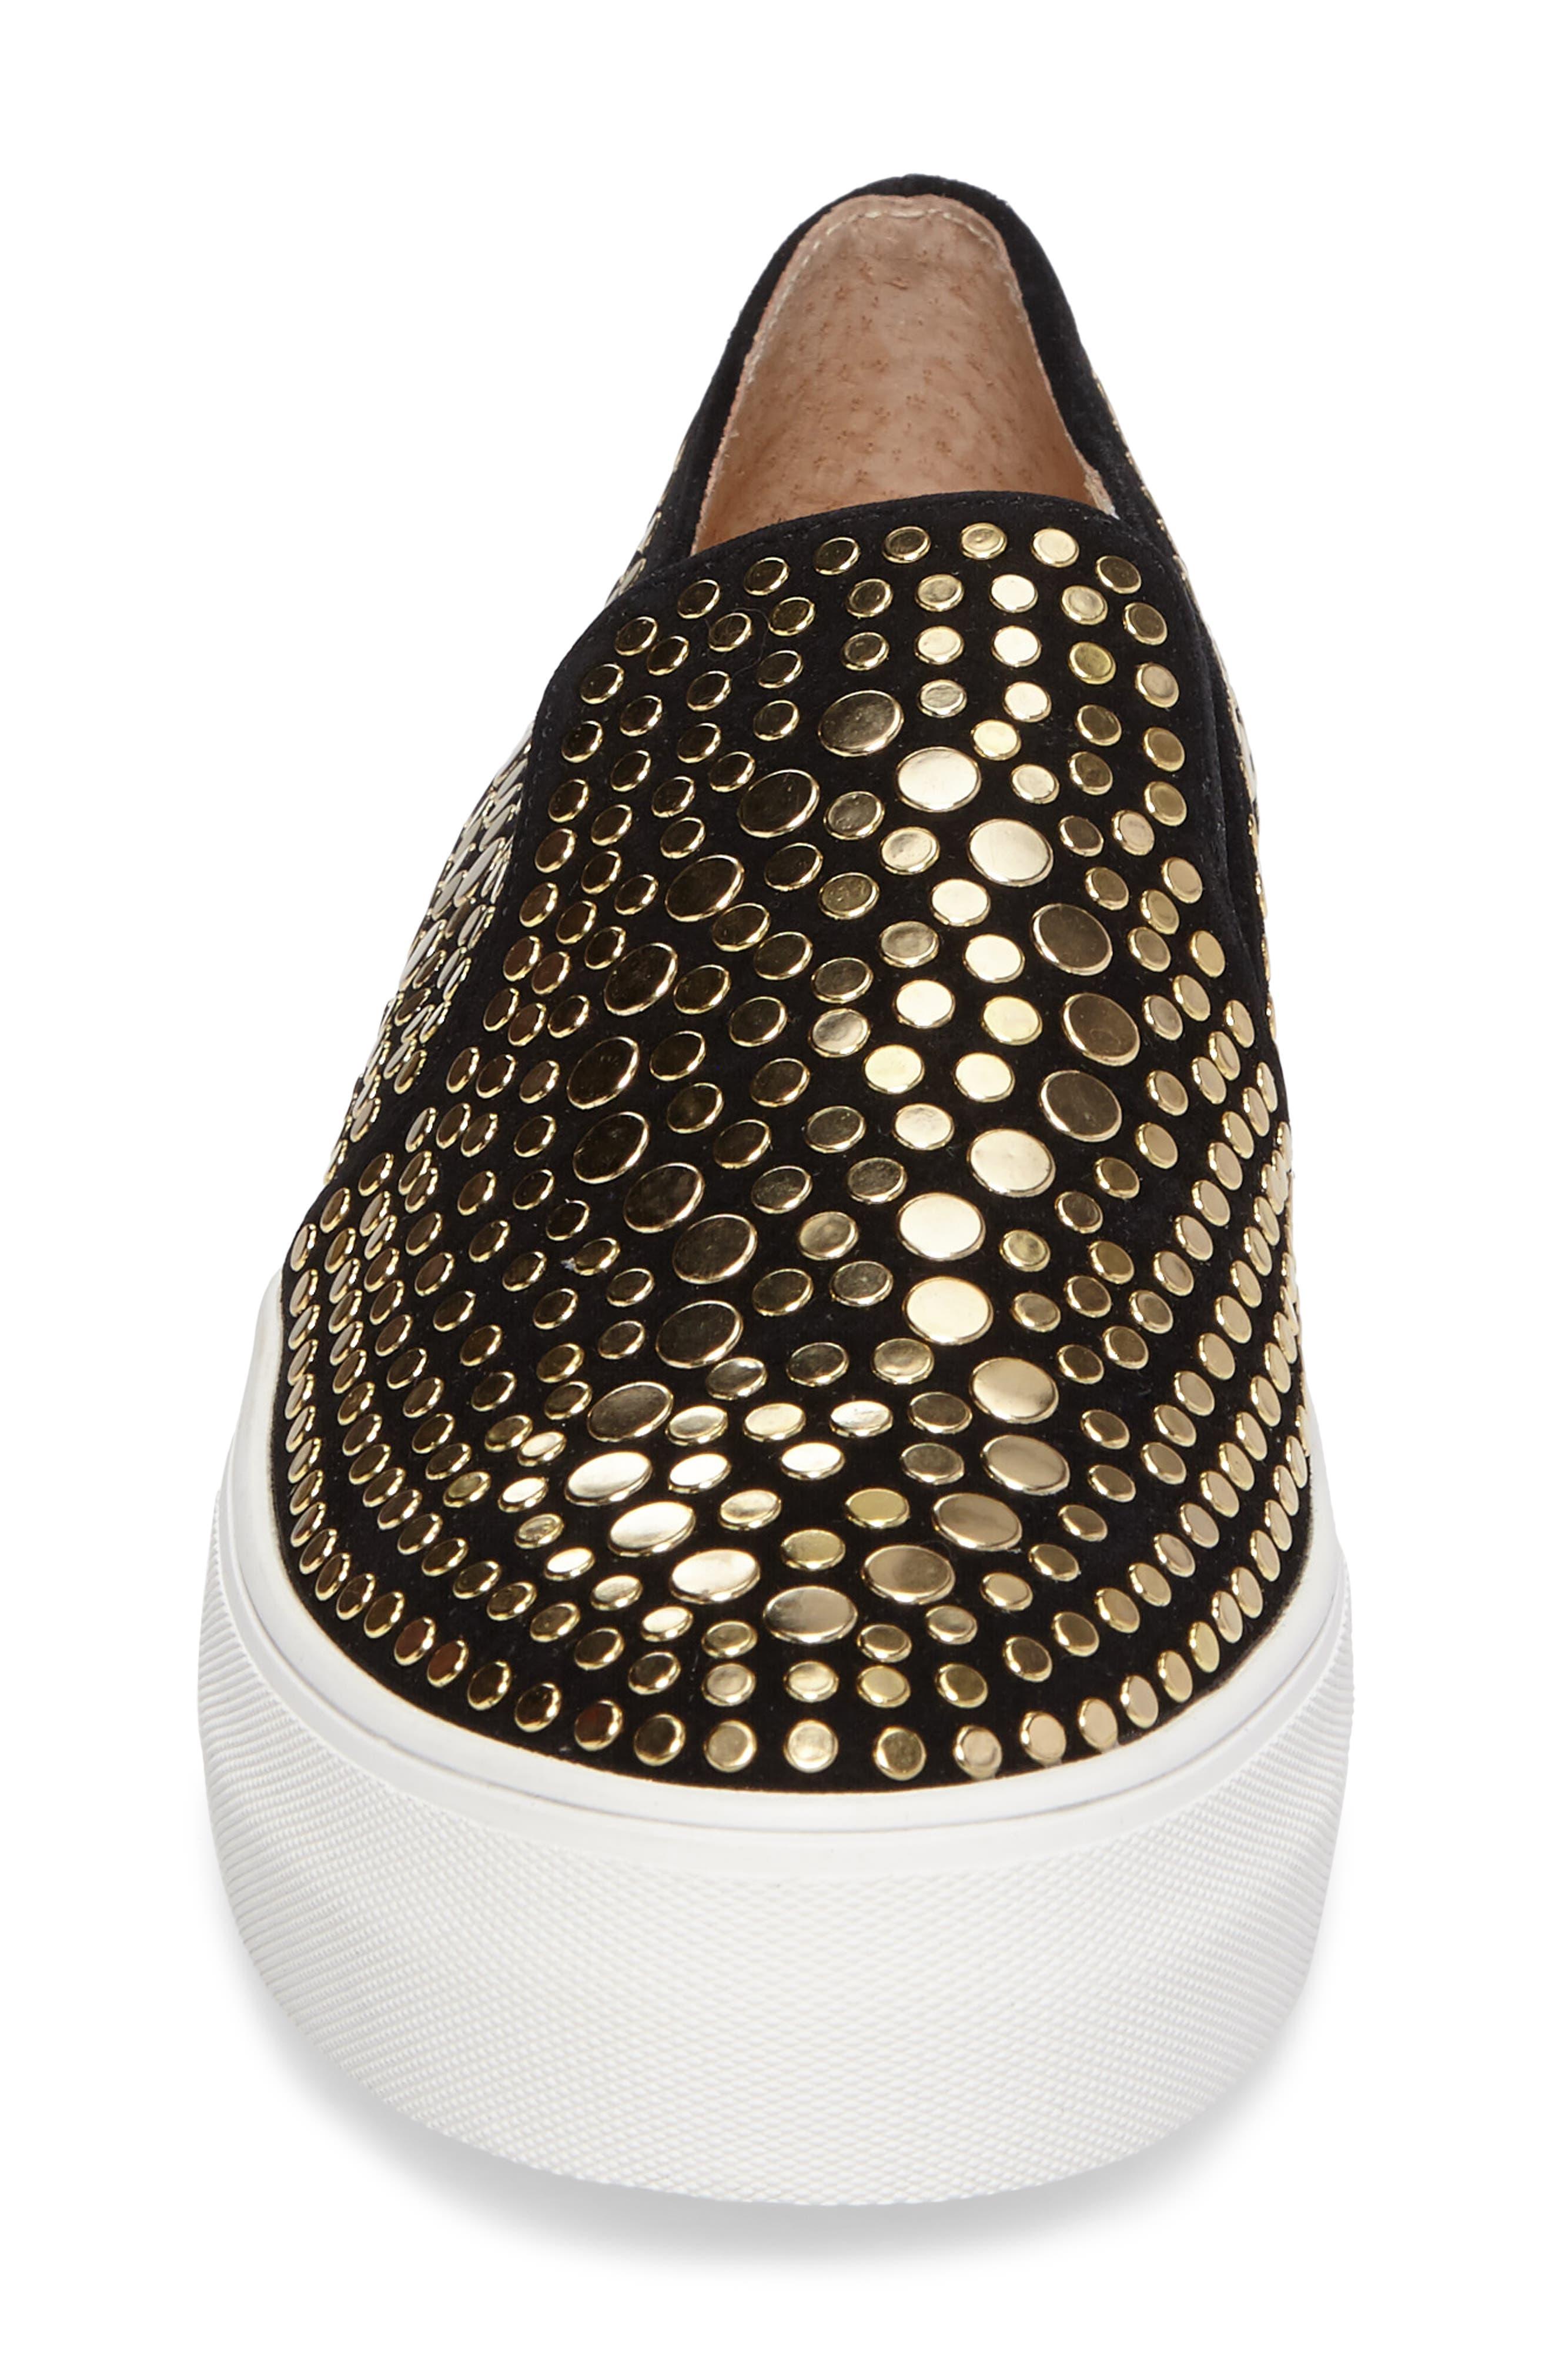 Alternate Image 4  - Vince Camuto Kindra Stud Slip-On Sneaker (Women)